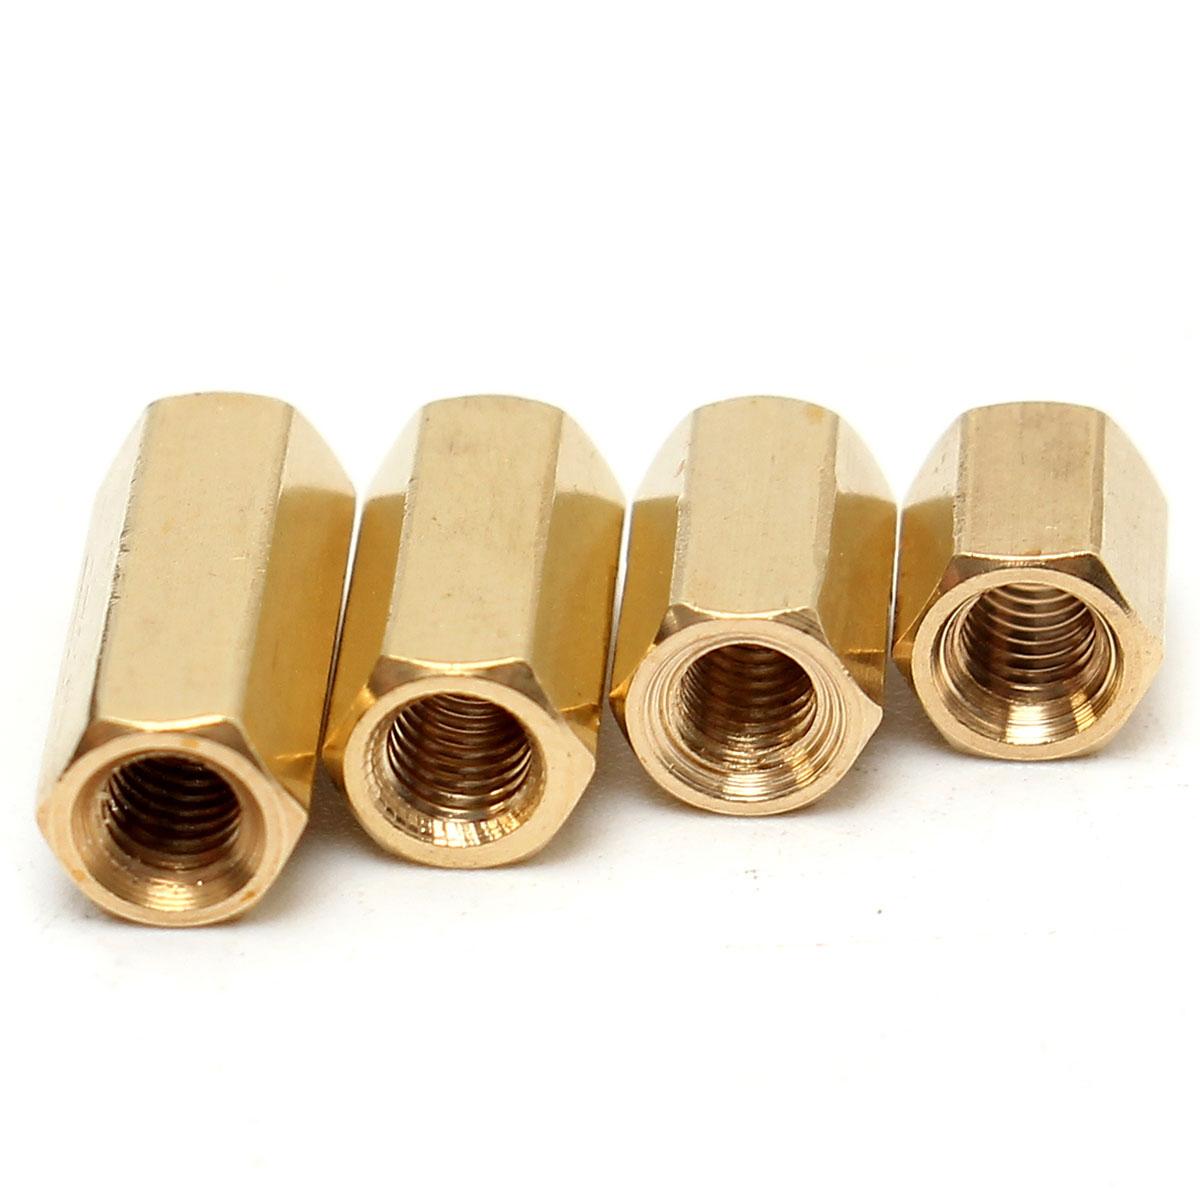 40Pcs Brass Hexagonal Female Nut M3 x 12mm Female Nut Bolts PCB Board Standoff/Spacer